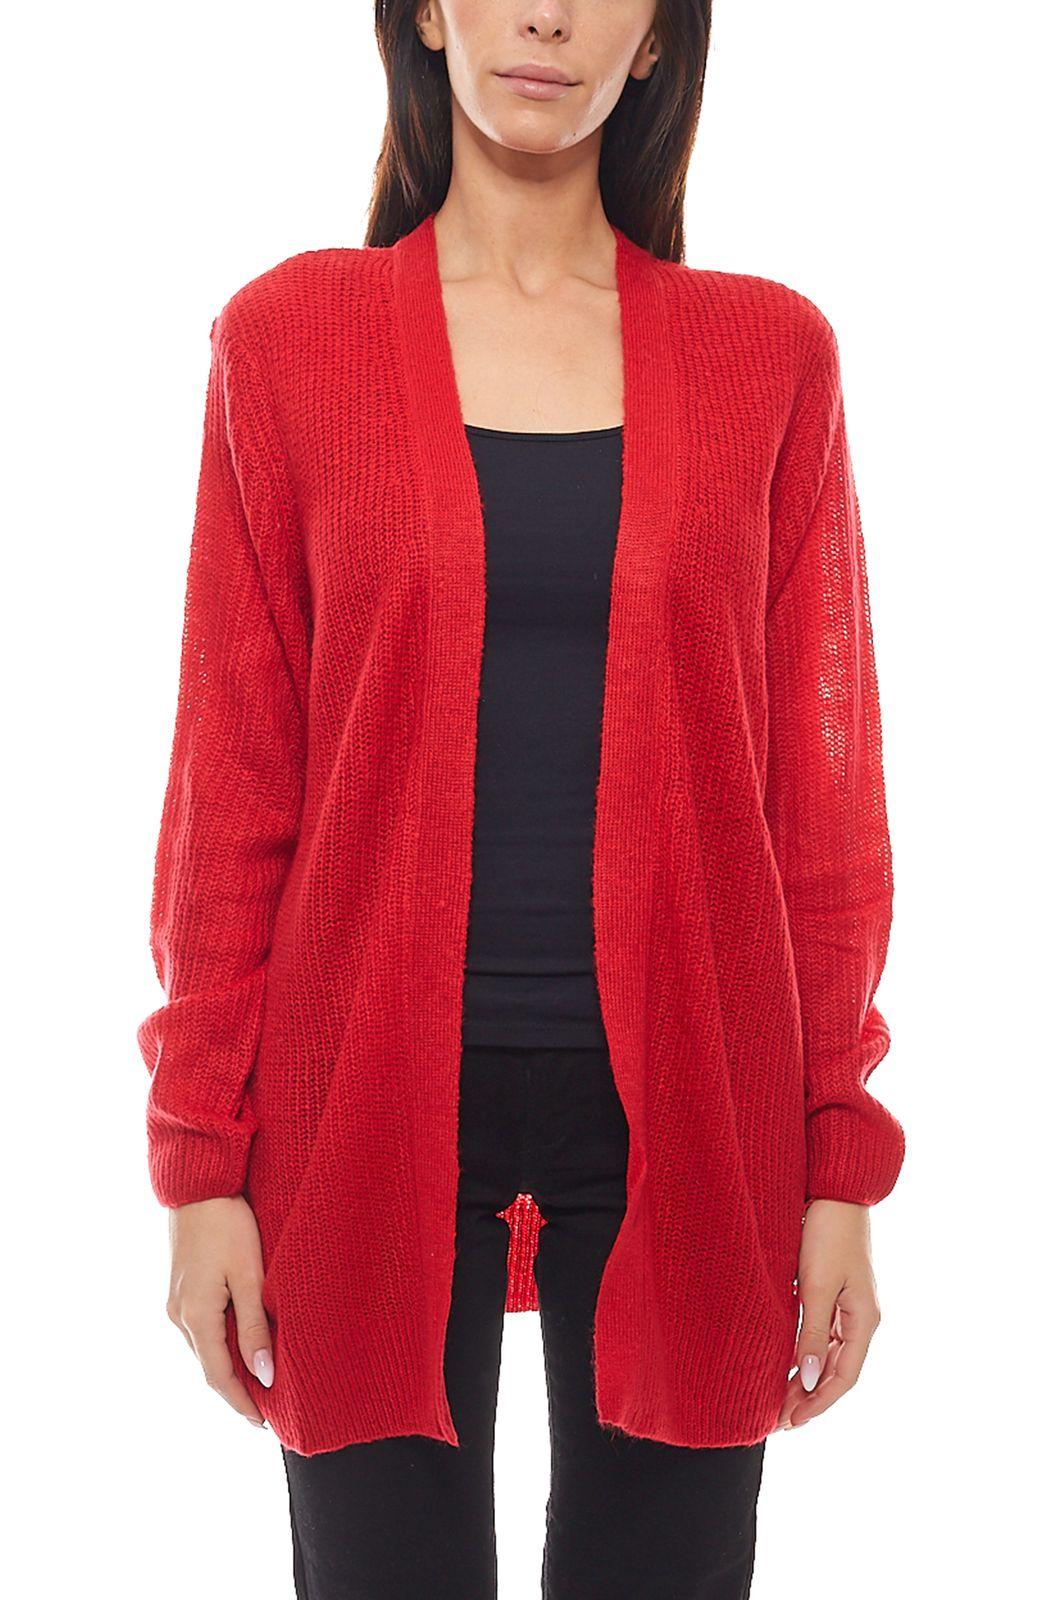 size 40 1d661 94aff Details zu Tom Tailor Cardigan kuschelige Damen Long-Strickjacke Jacke  Freizeit-Jacke Rot